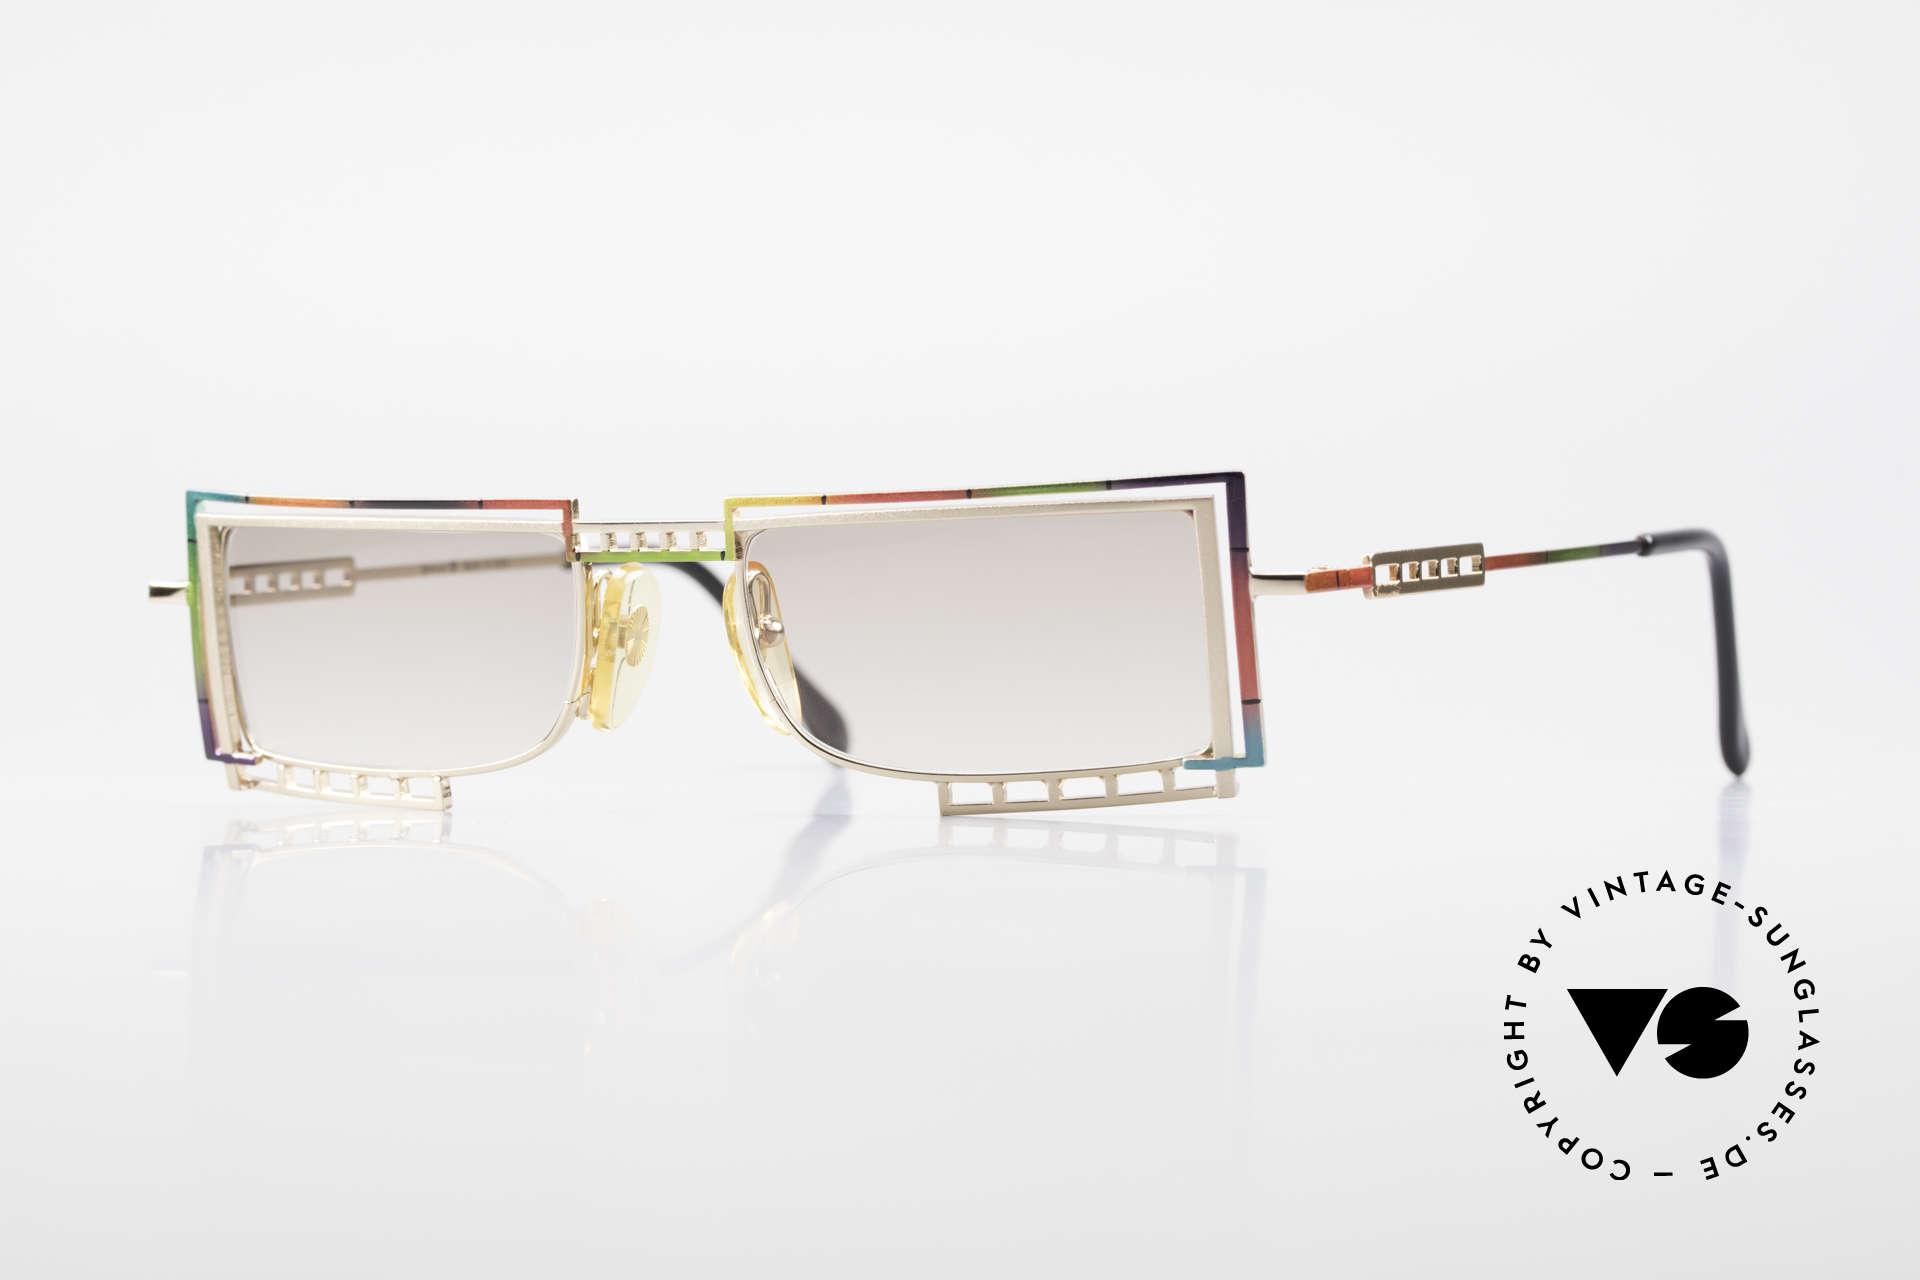 Casanova LC4 Square Vintage Sunglasses, glamorous CASANOVA sunglasses from around 1985, Made for Men and Women